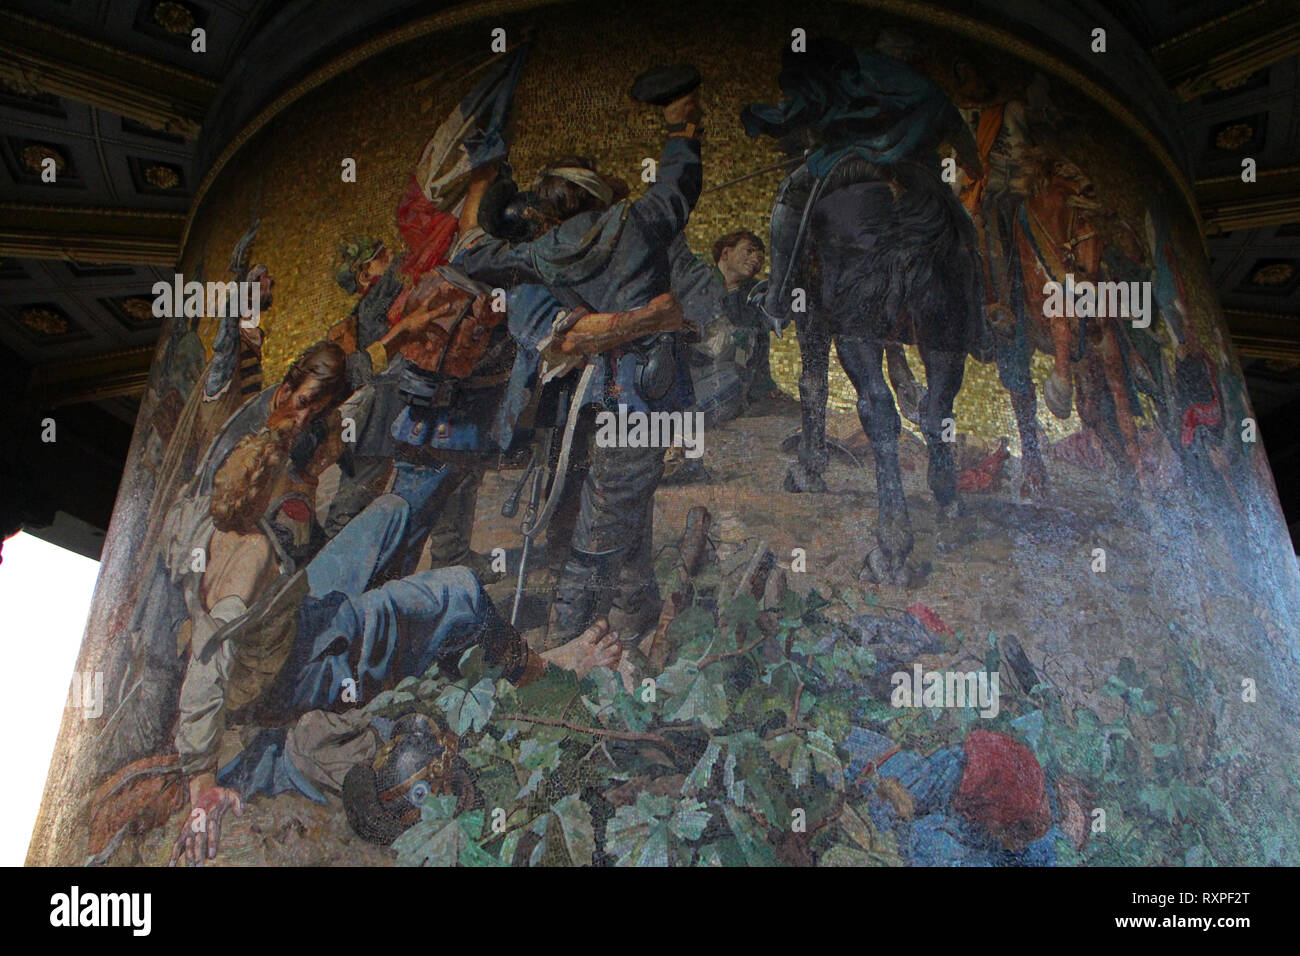 Artwork depicting Danish-Prussian War on rotunda of victory column in Berlin - Stock Image